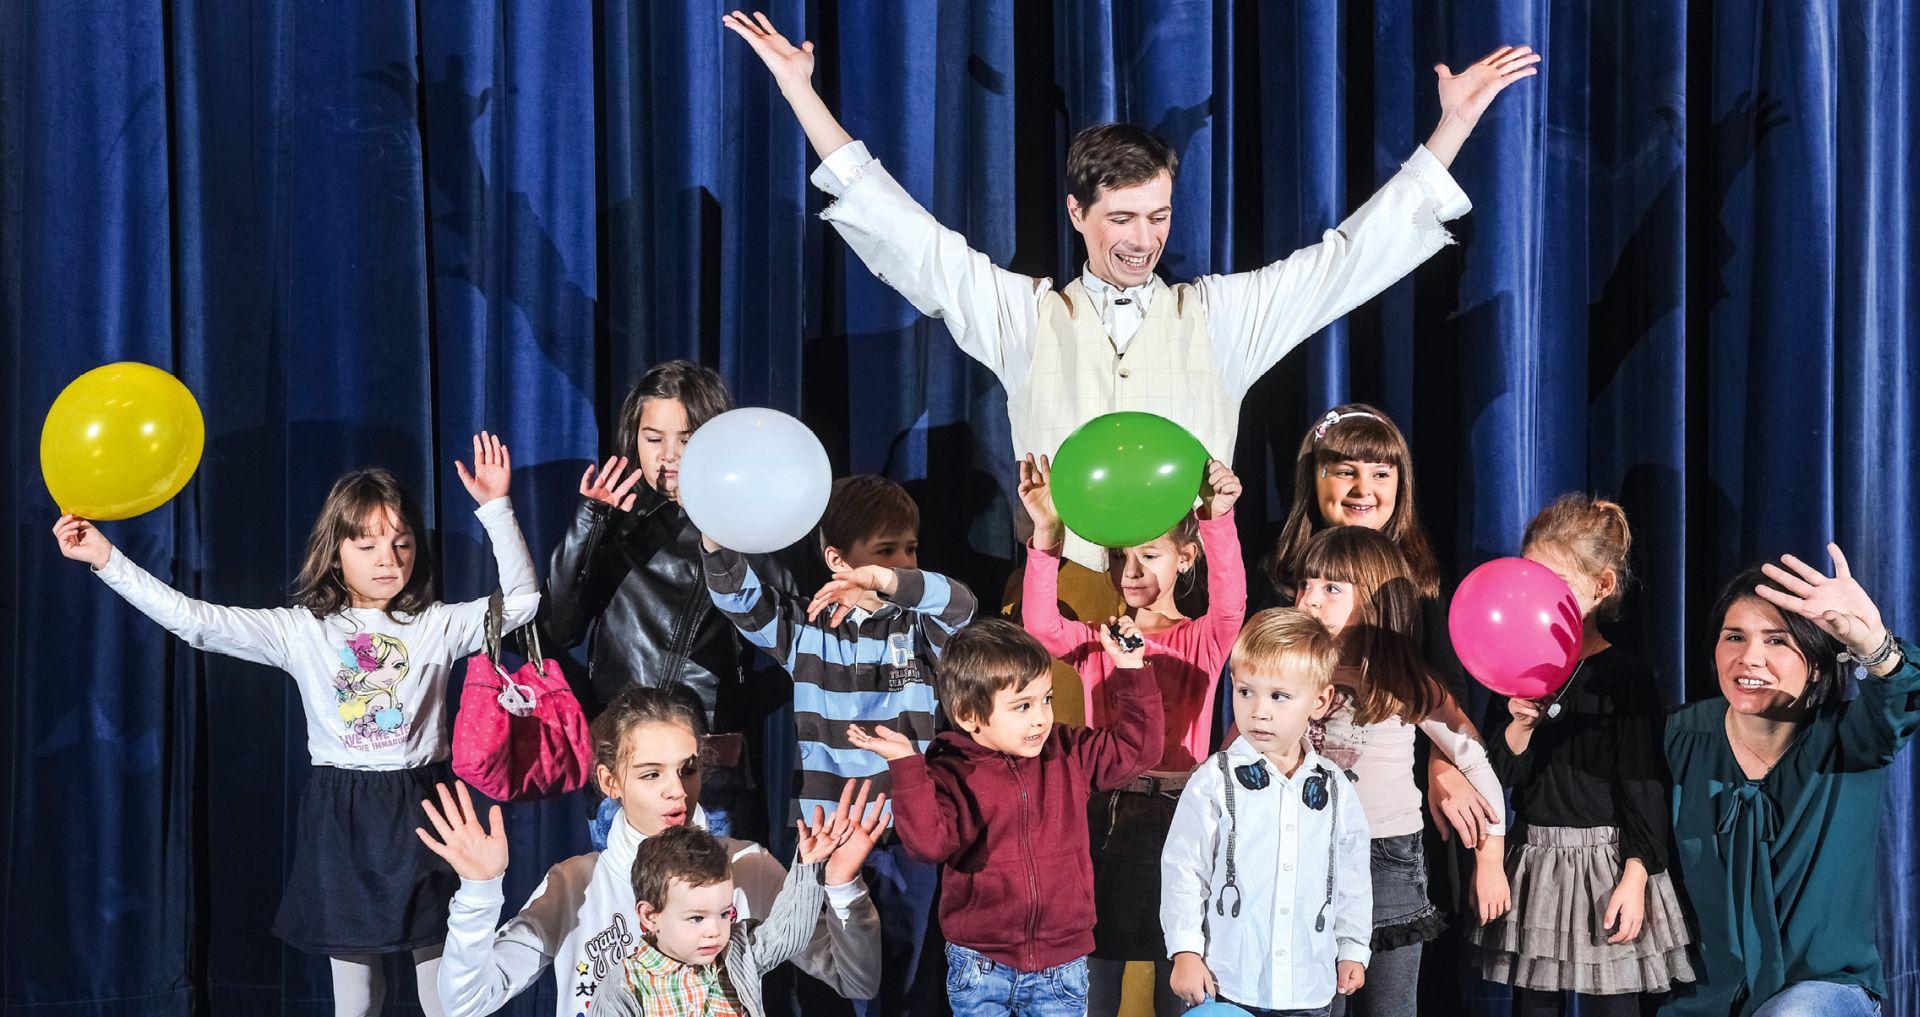 DOSSIER Proslave dječjih rođendana postale unosan biznis